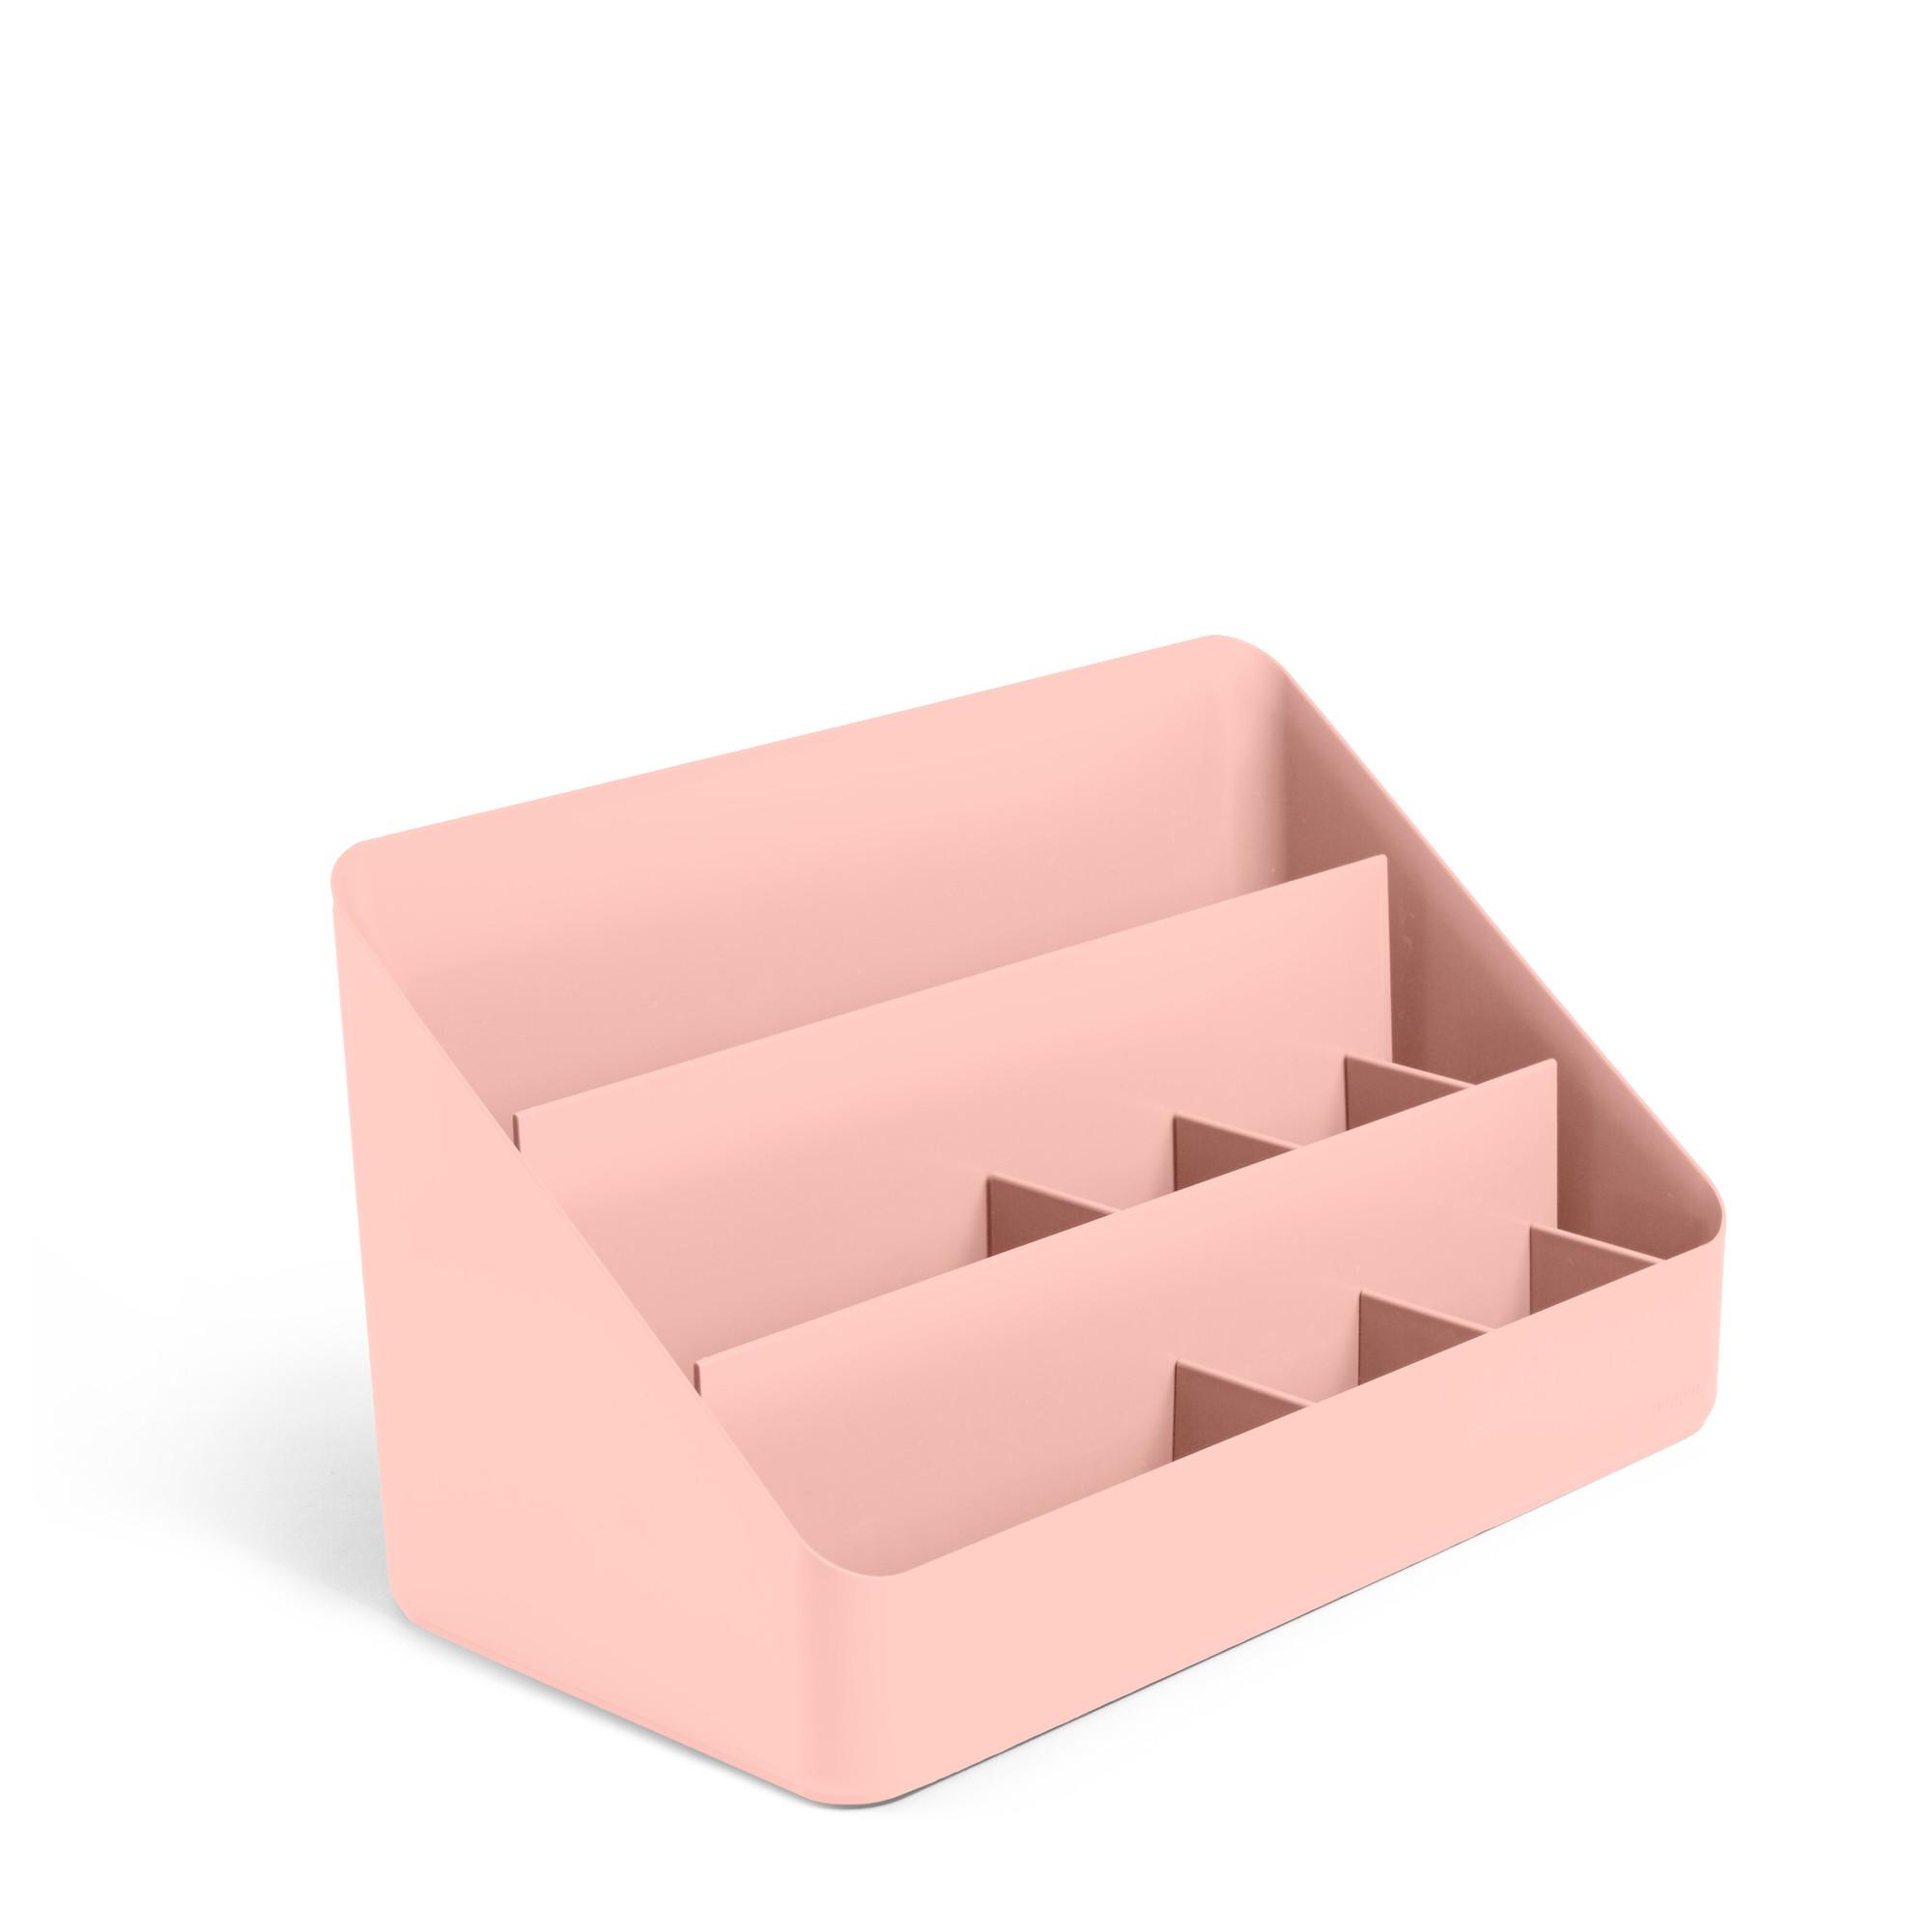 Blush Desk Organizer  Desktop Organization  Poppin